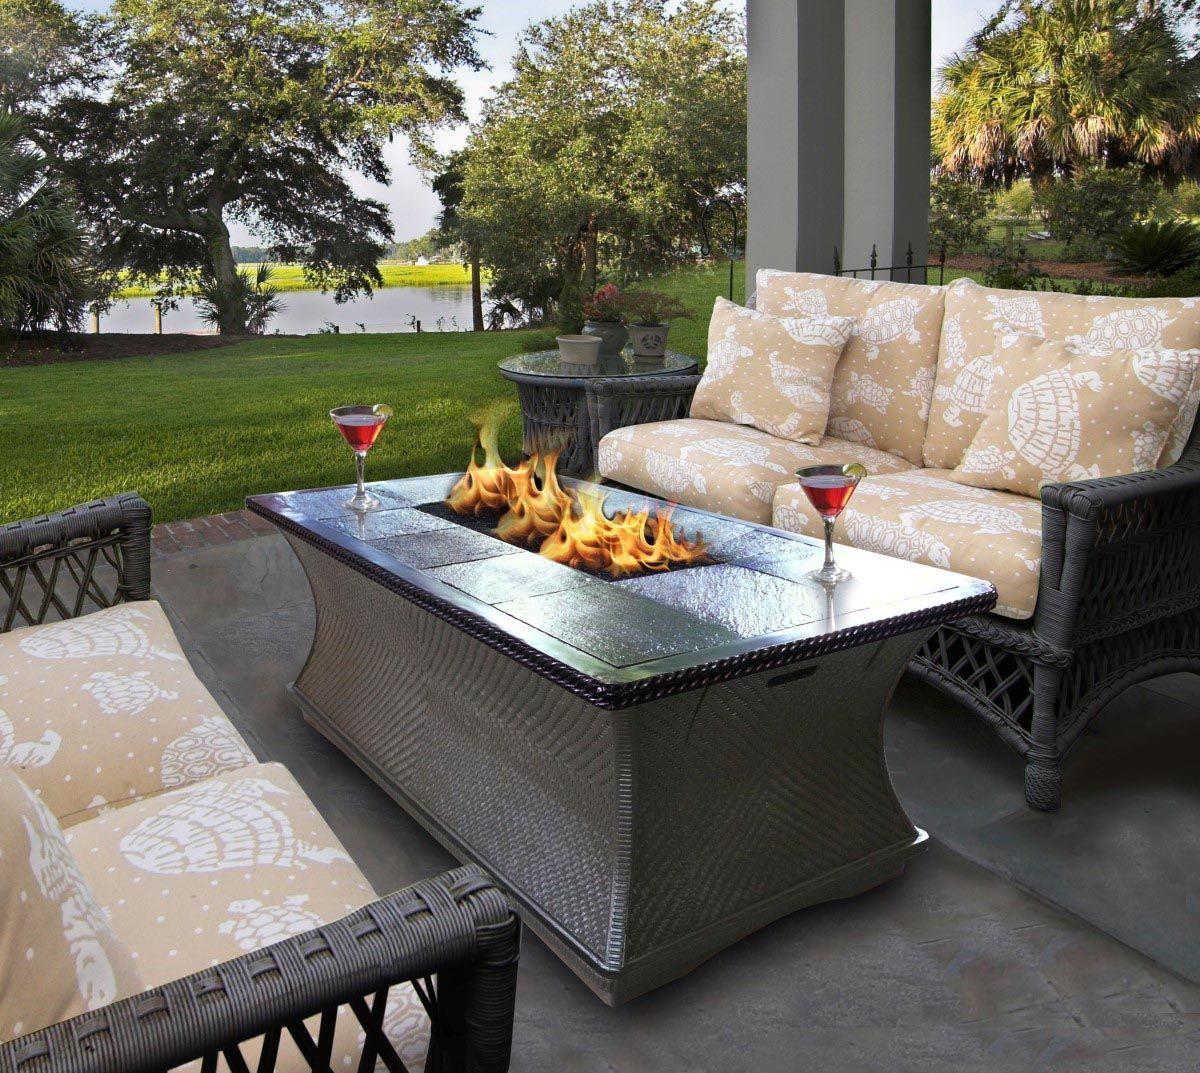 Gentil DIY Propane Fire Pit Table